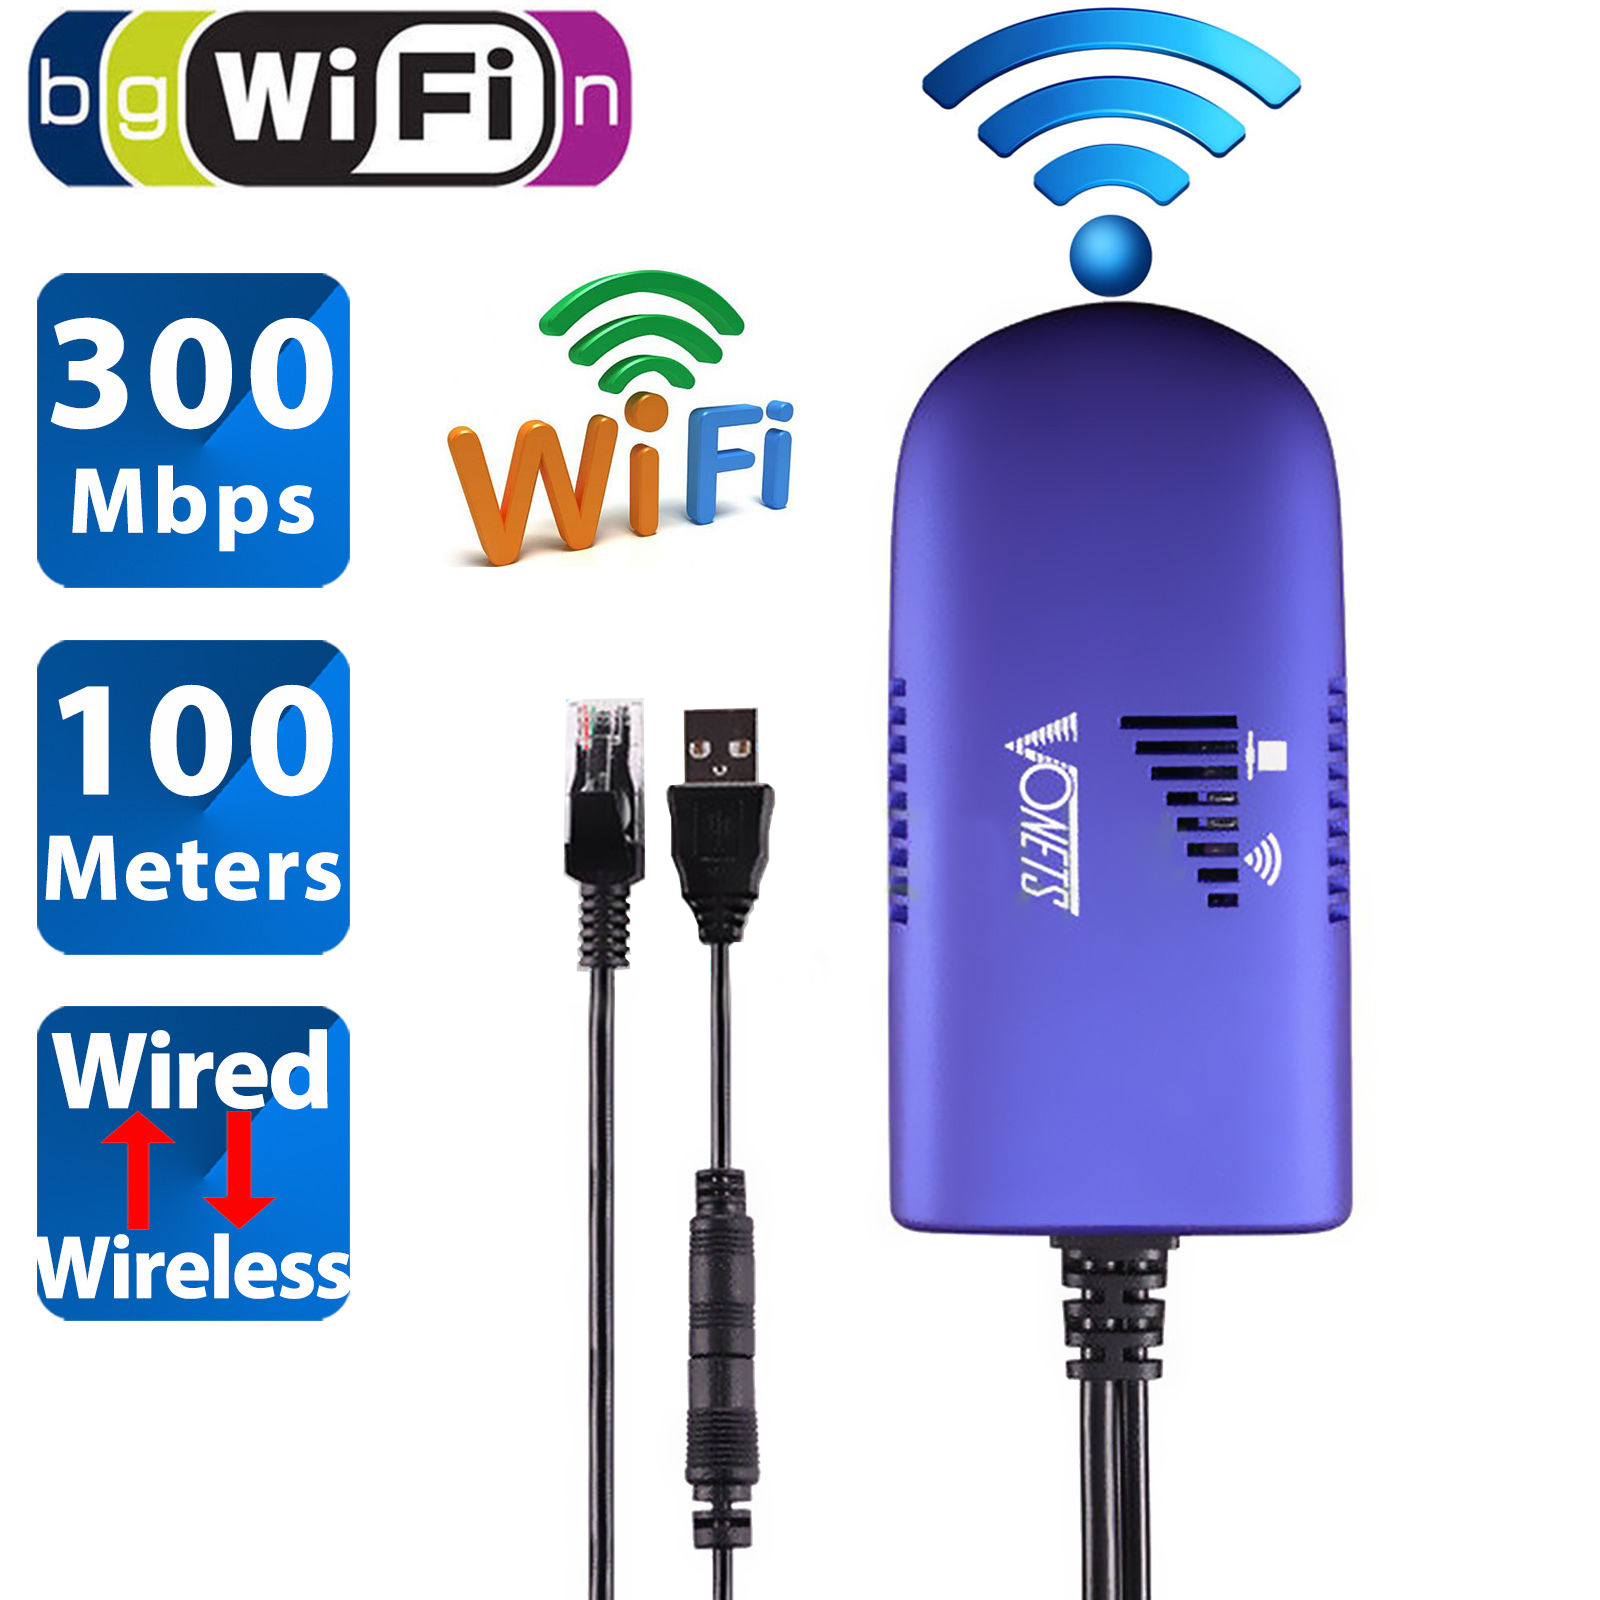 TSV VAP11G Wireless Bridge Cable Convert RJ45 Ethernet Port to WiFi Dongle AP Vonets